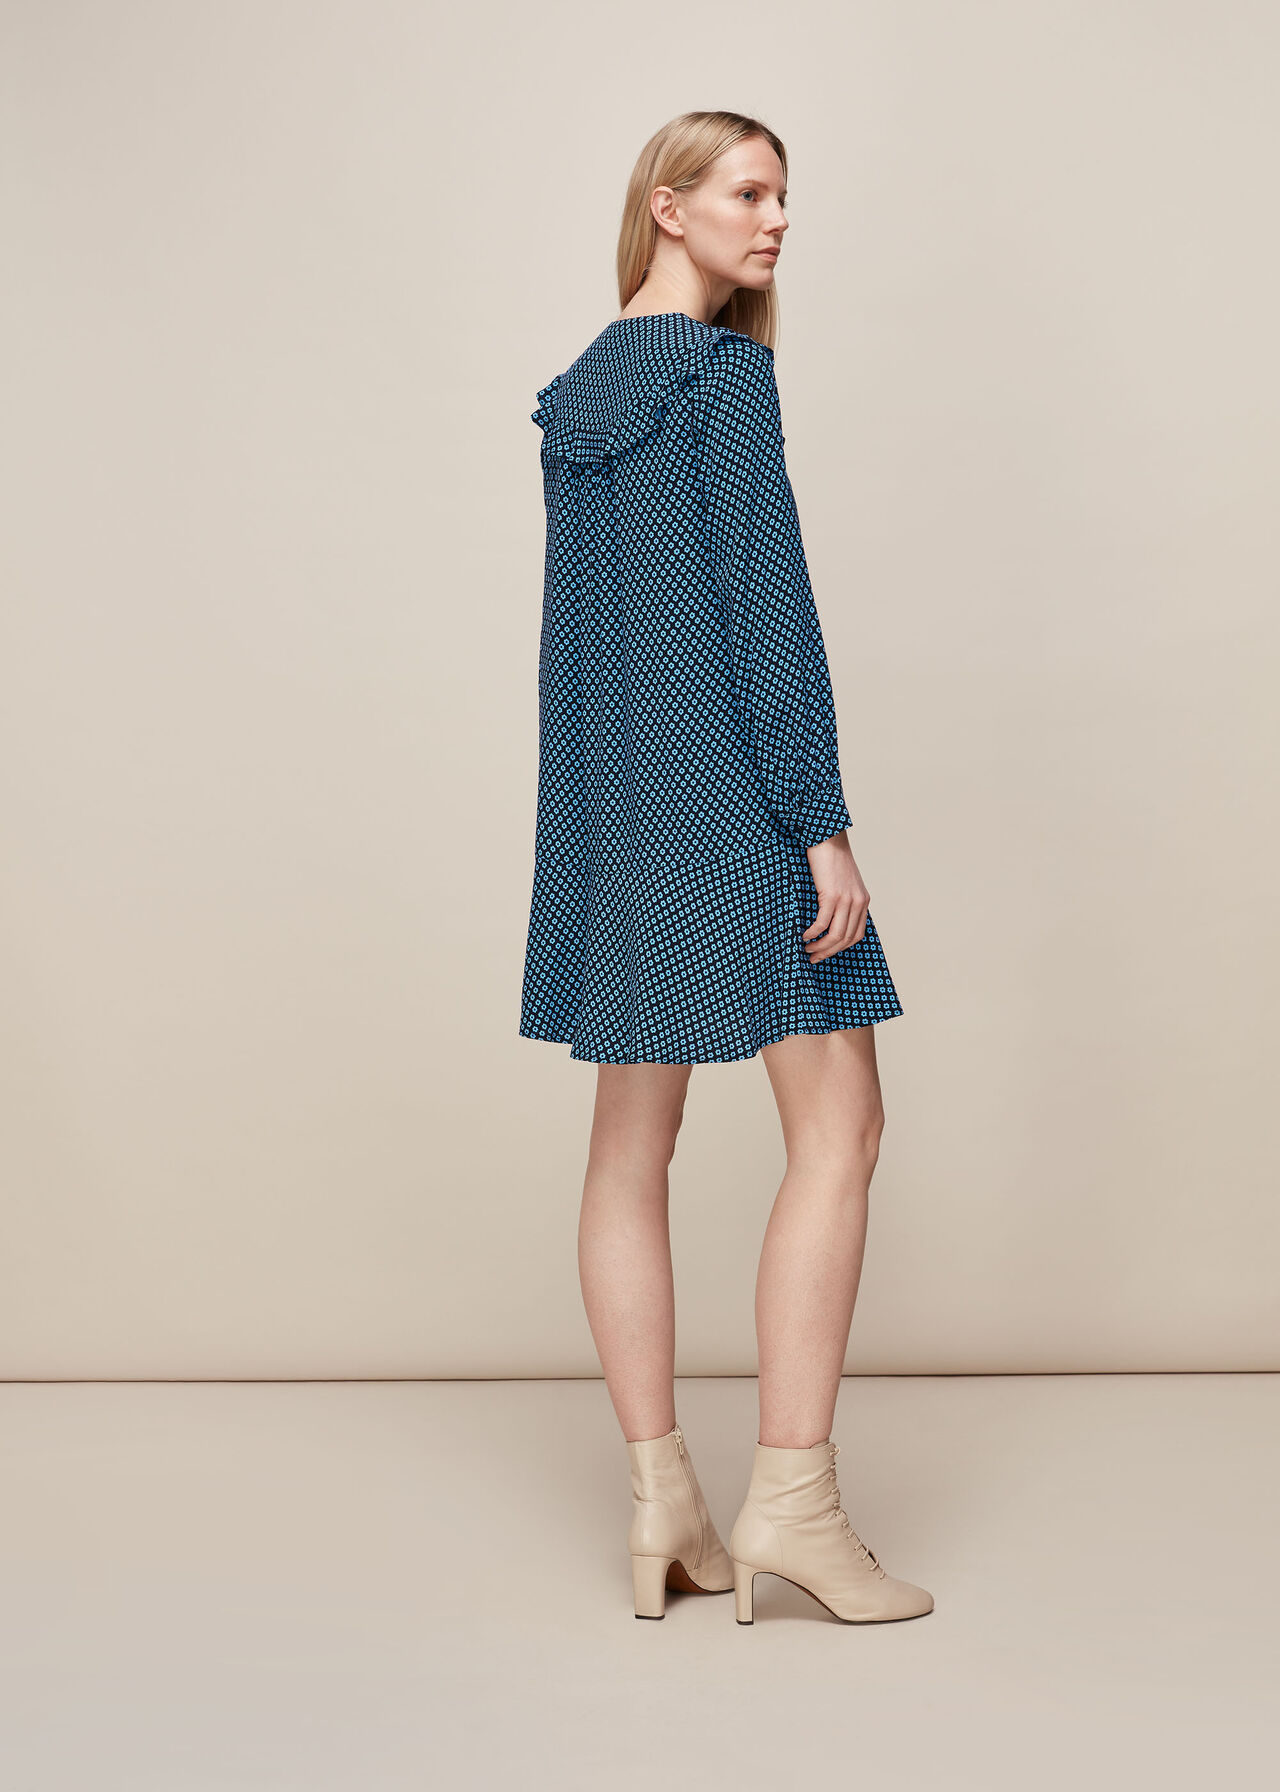 Daisy Print Frill Dress